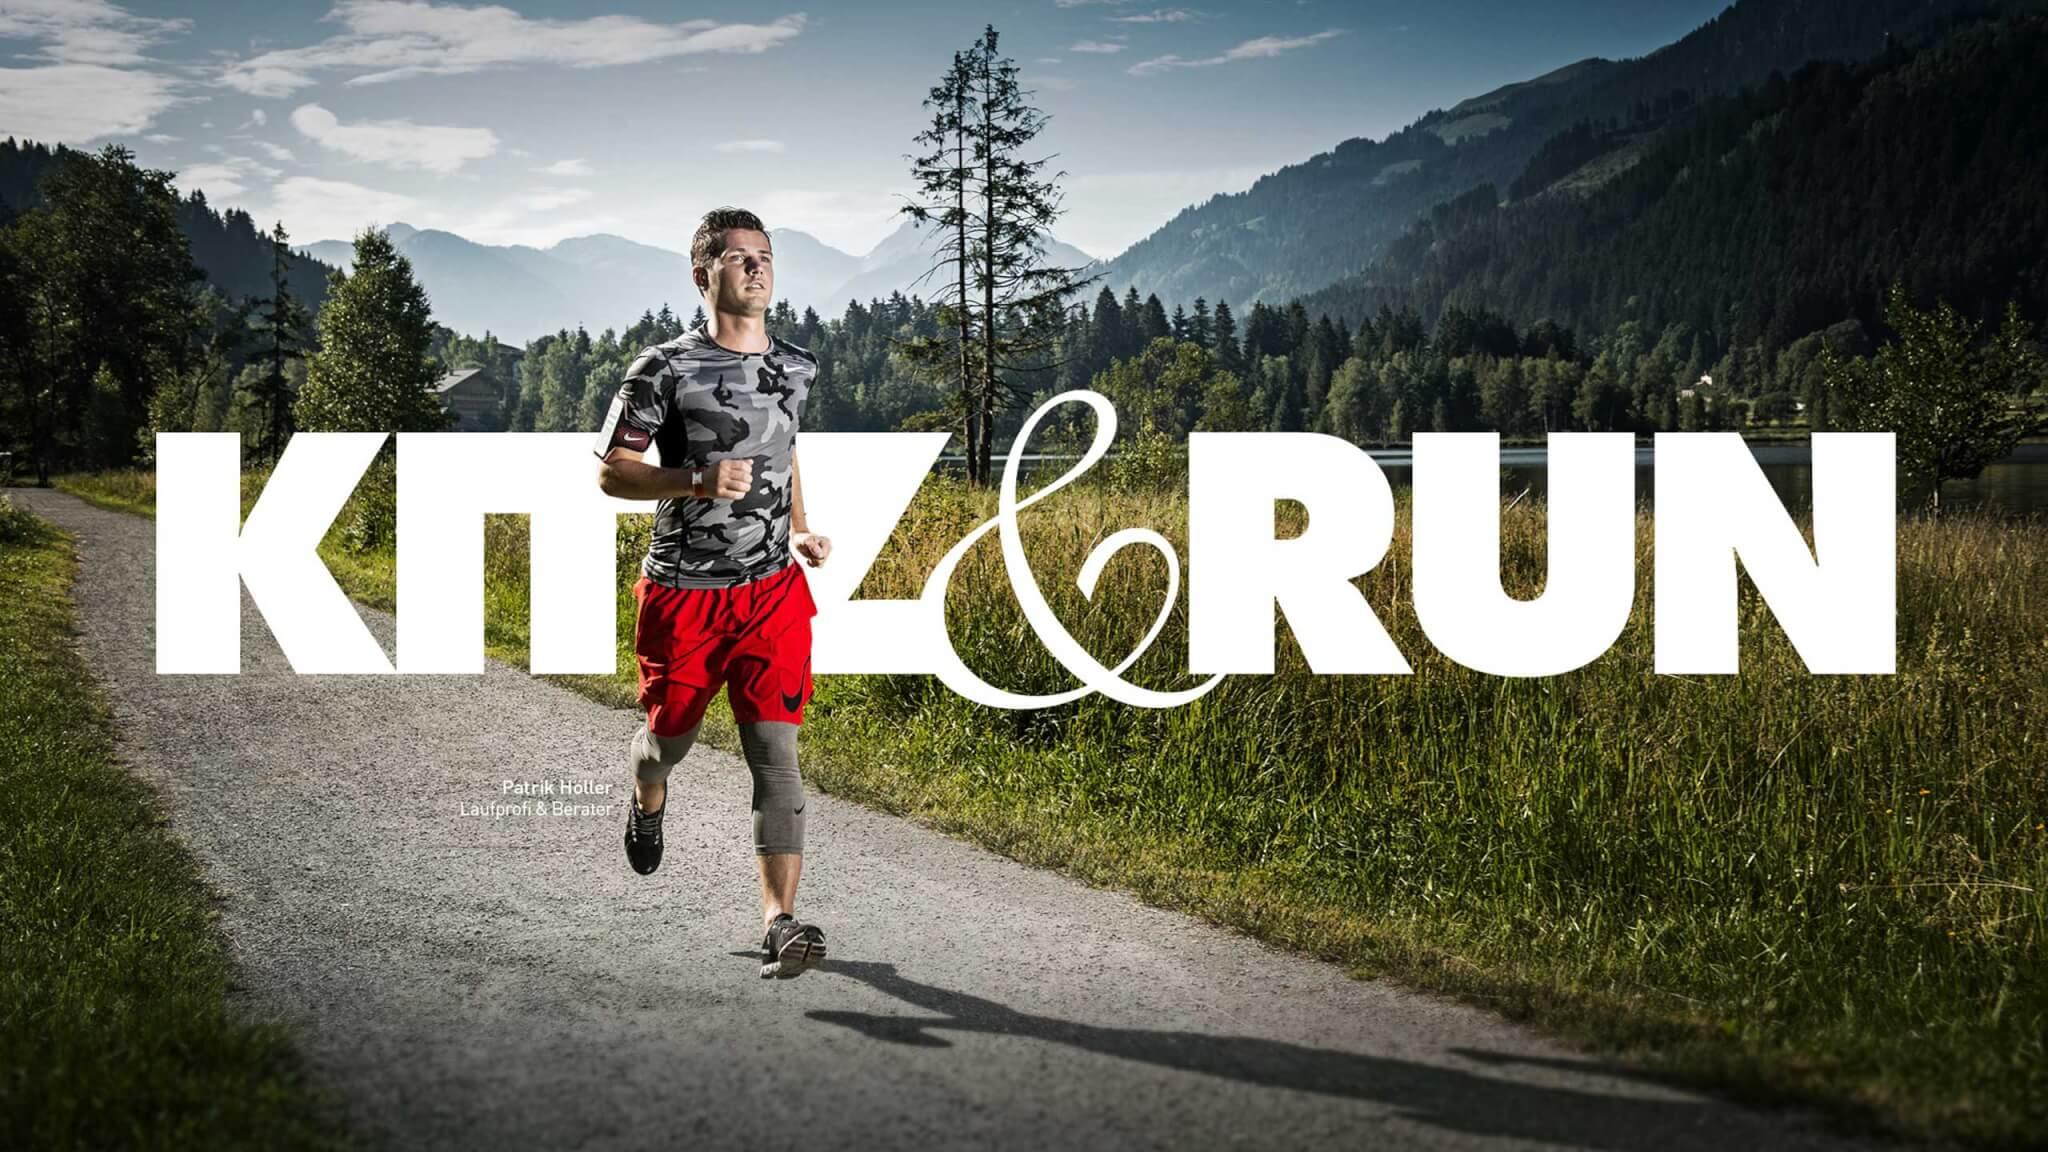 Kitzsport Kitz&Run Kitzbühel